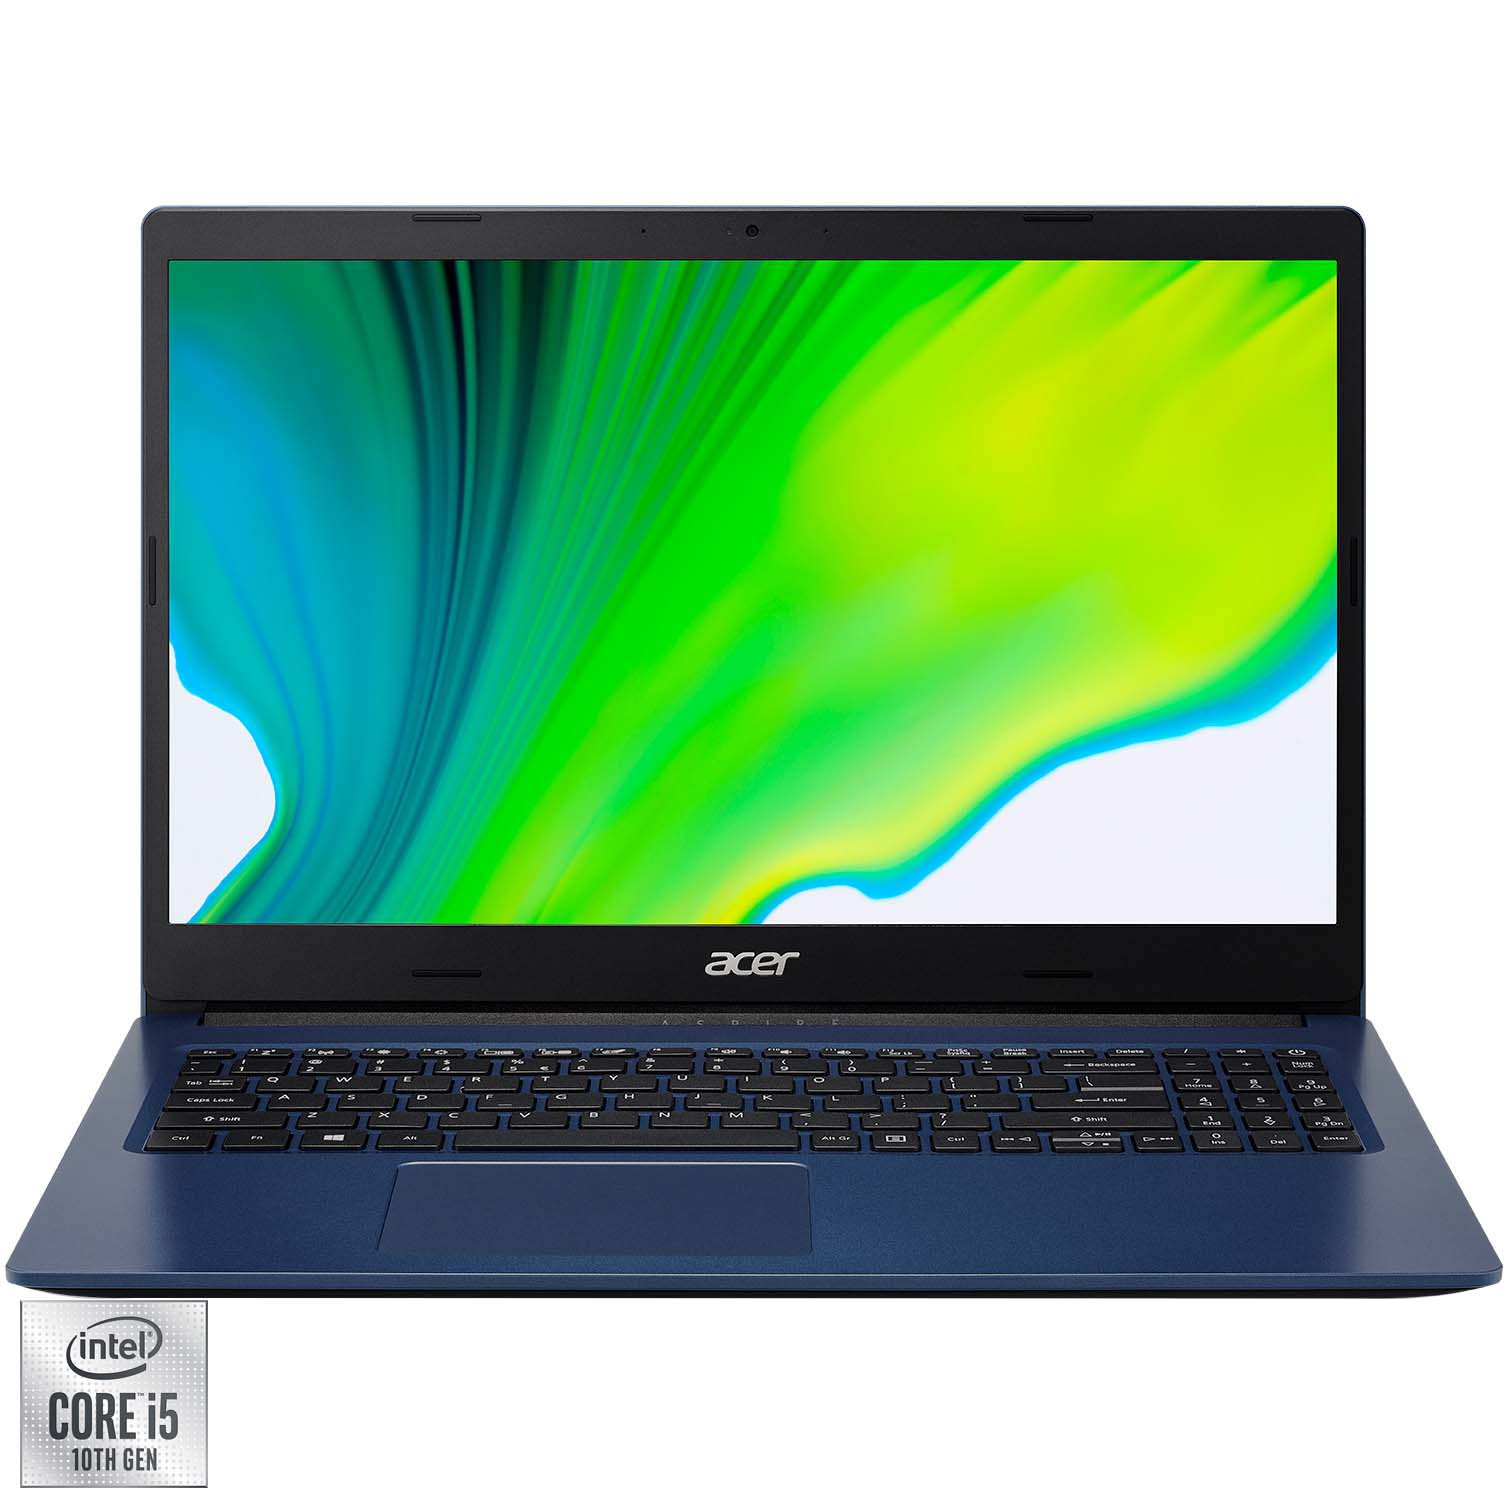 "Fotografie Laptop Acer Aspire 3 A315-57G cu procesor Intel Core i5-1035G1 pana la 3.60 GHz, 15.6"", Full HD, 8GB, 256GB SSD, NVIDIA® GeForce® MX330 2GB, No OS, Indigo Blue"